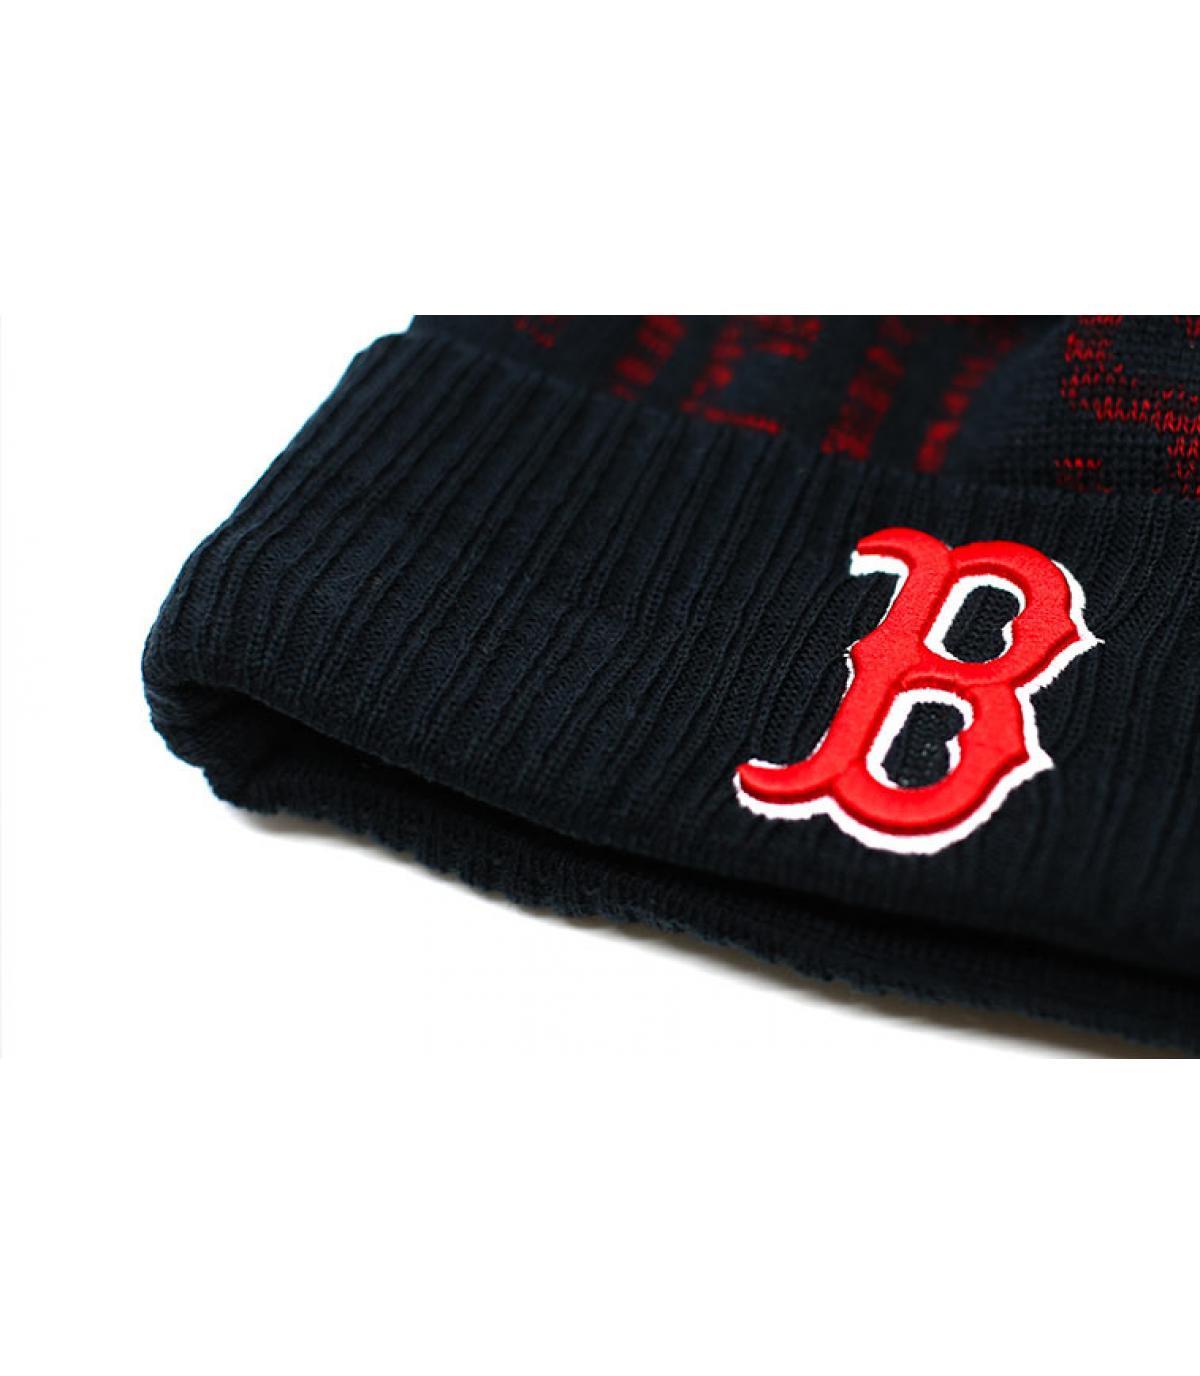 Details MLB Sport Knit Boston - afbeeling 3